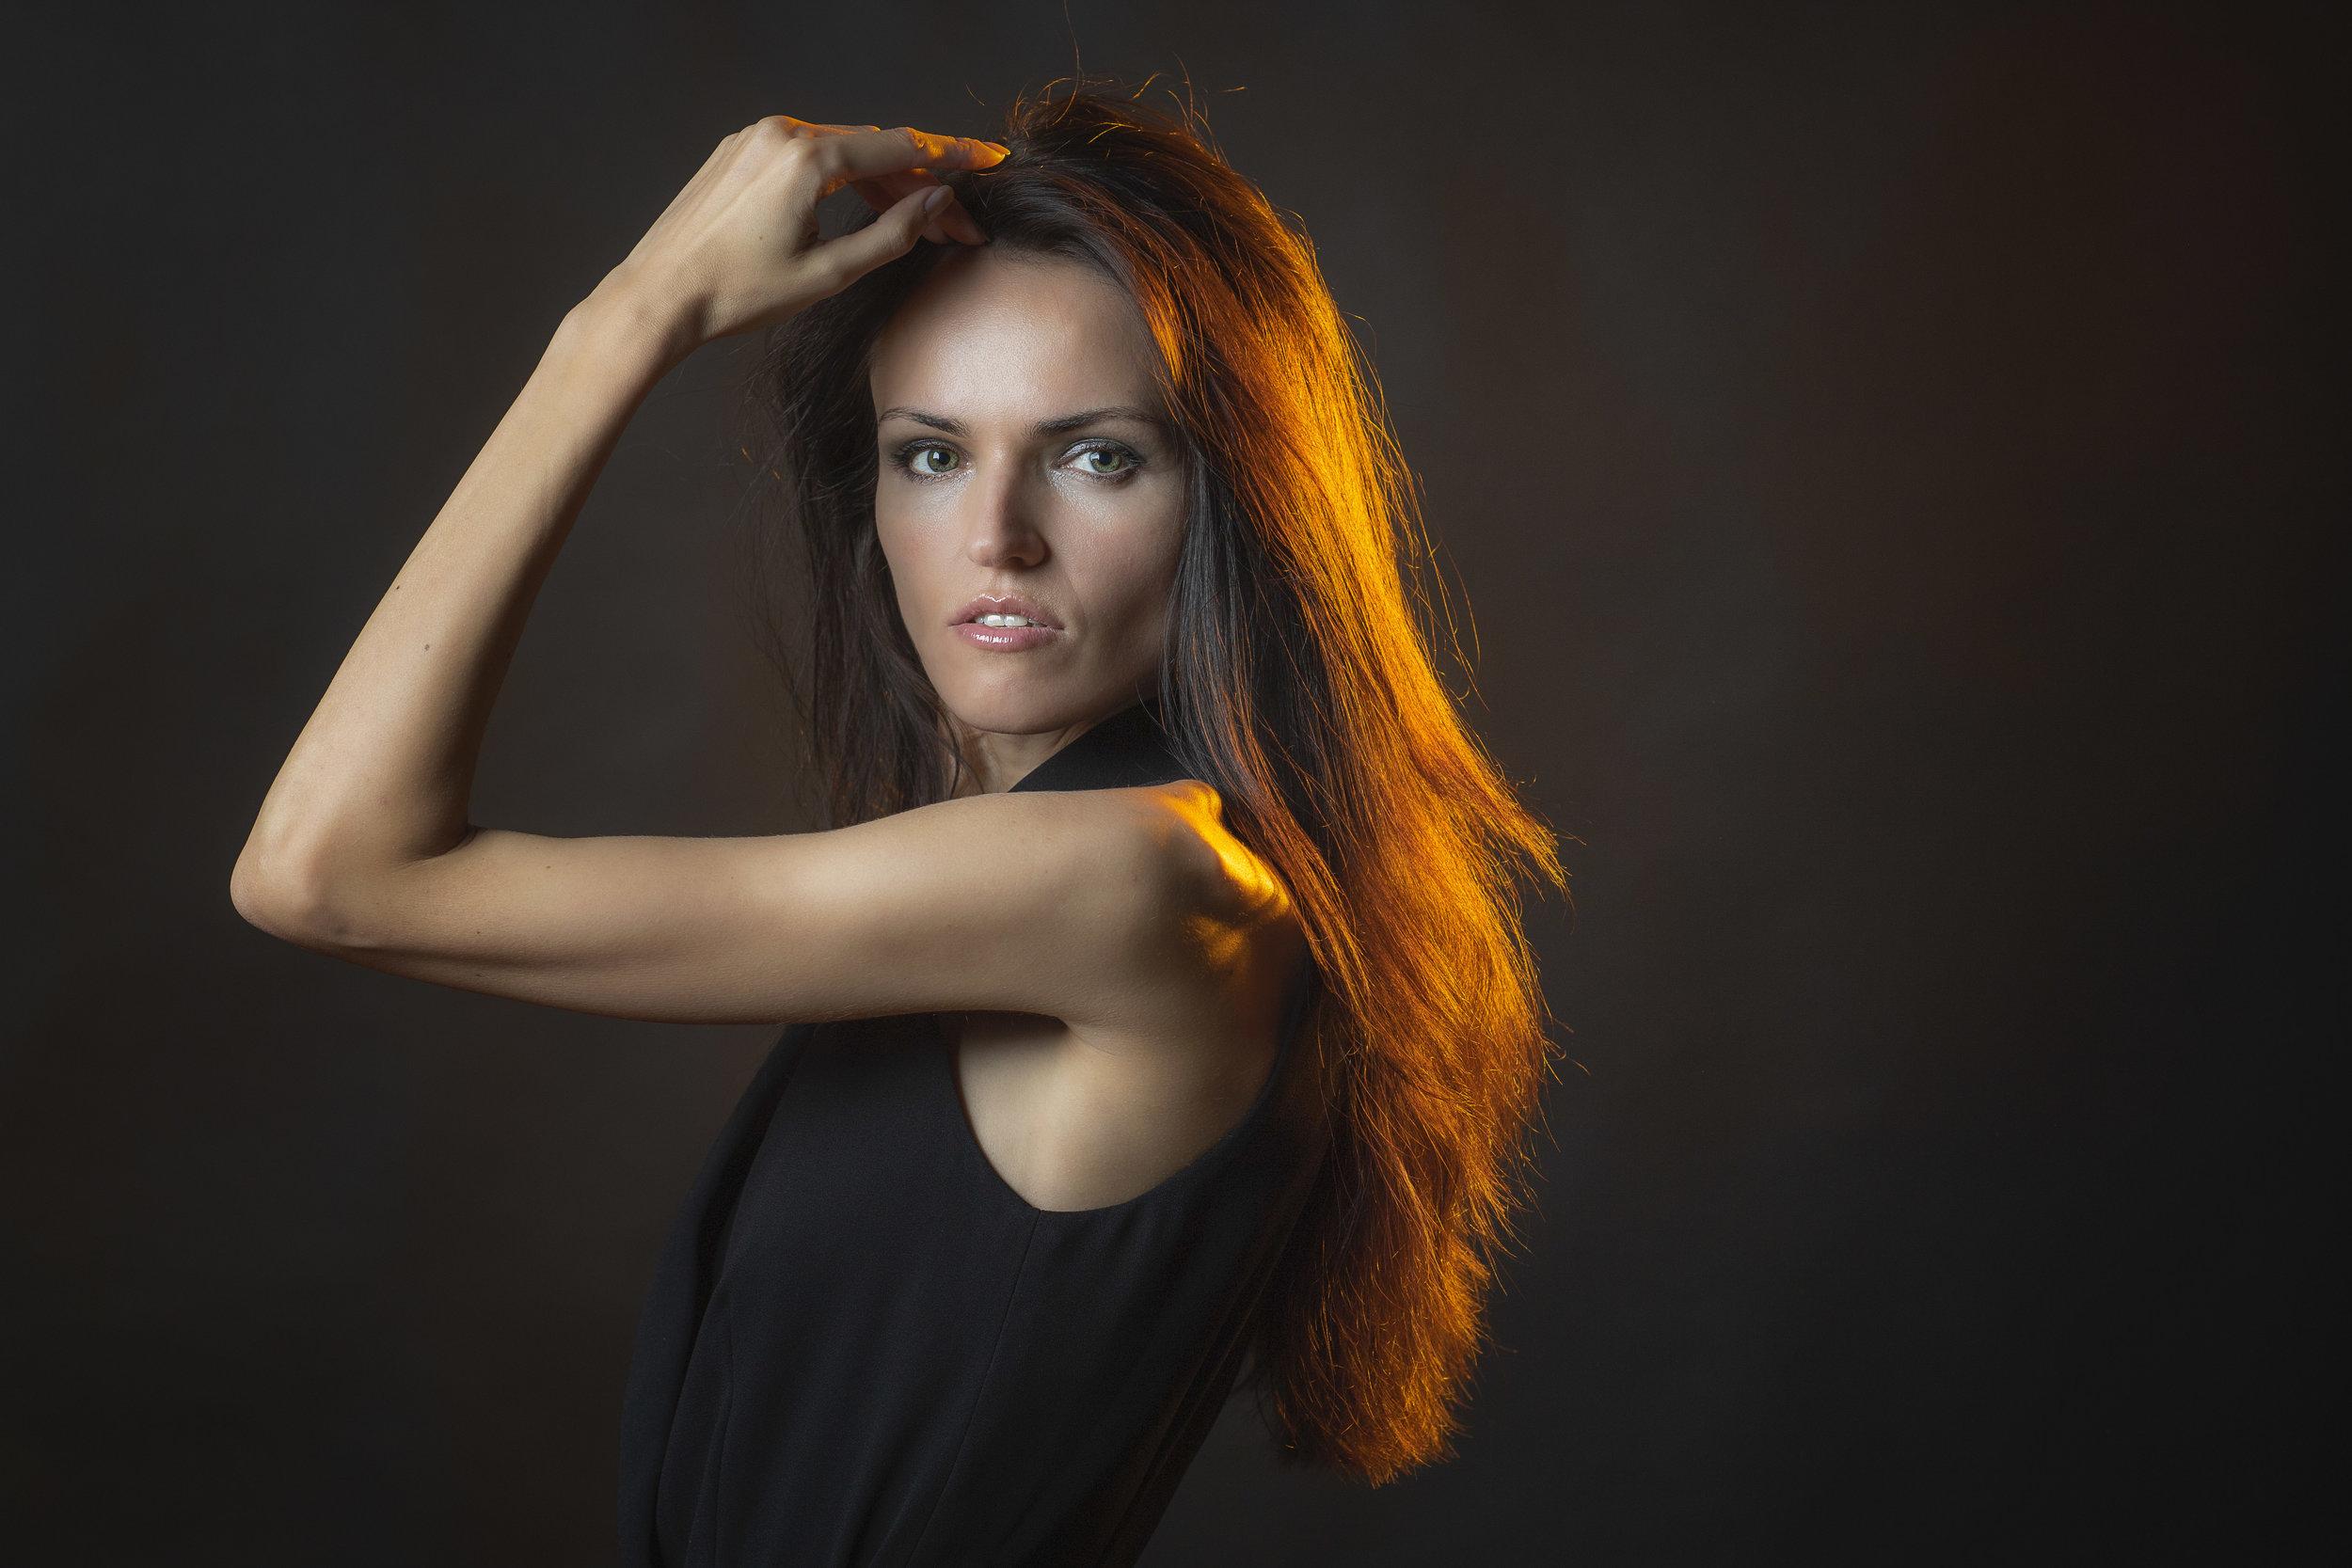 Fotomodell: Olga Ritter